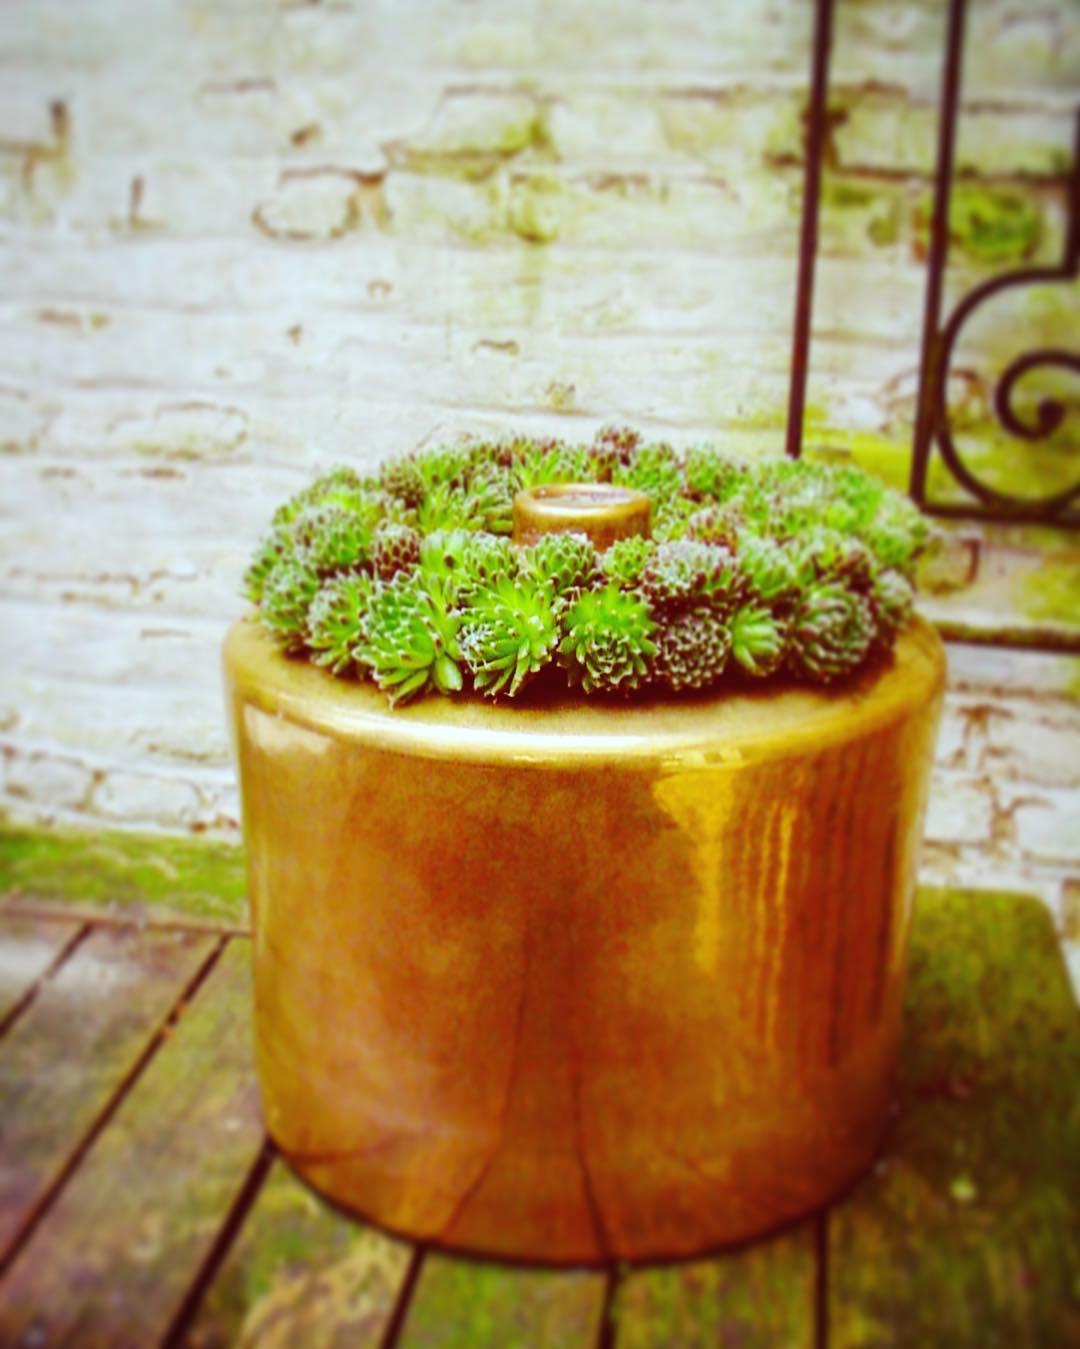 sempervivum plant outdoors vase ecri gold oldwall funeral autumn flowershop antwerp florartesantwerp